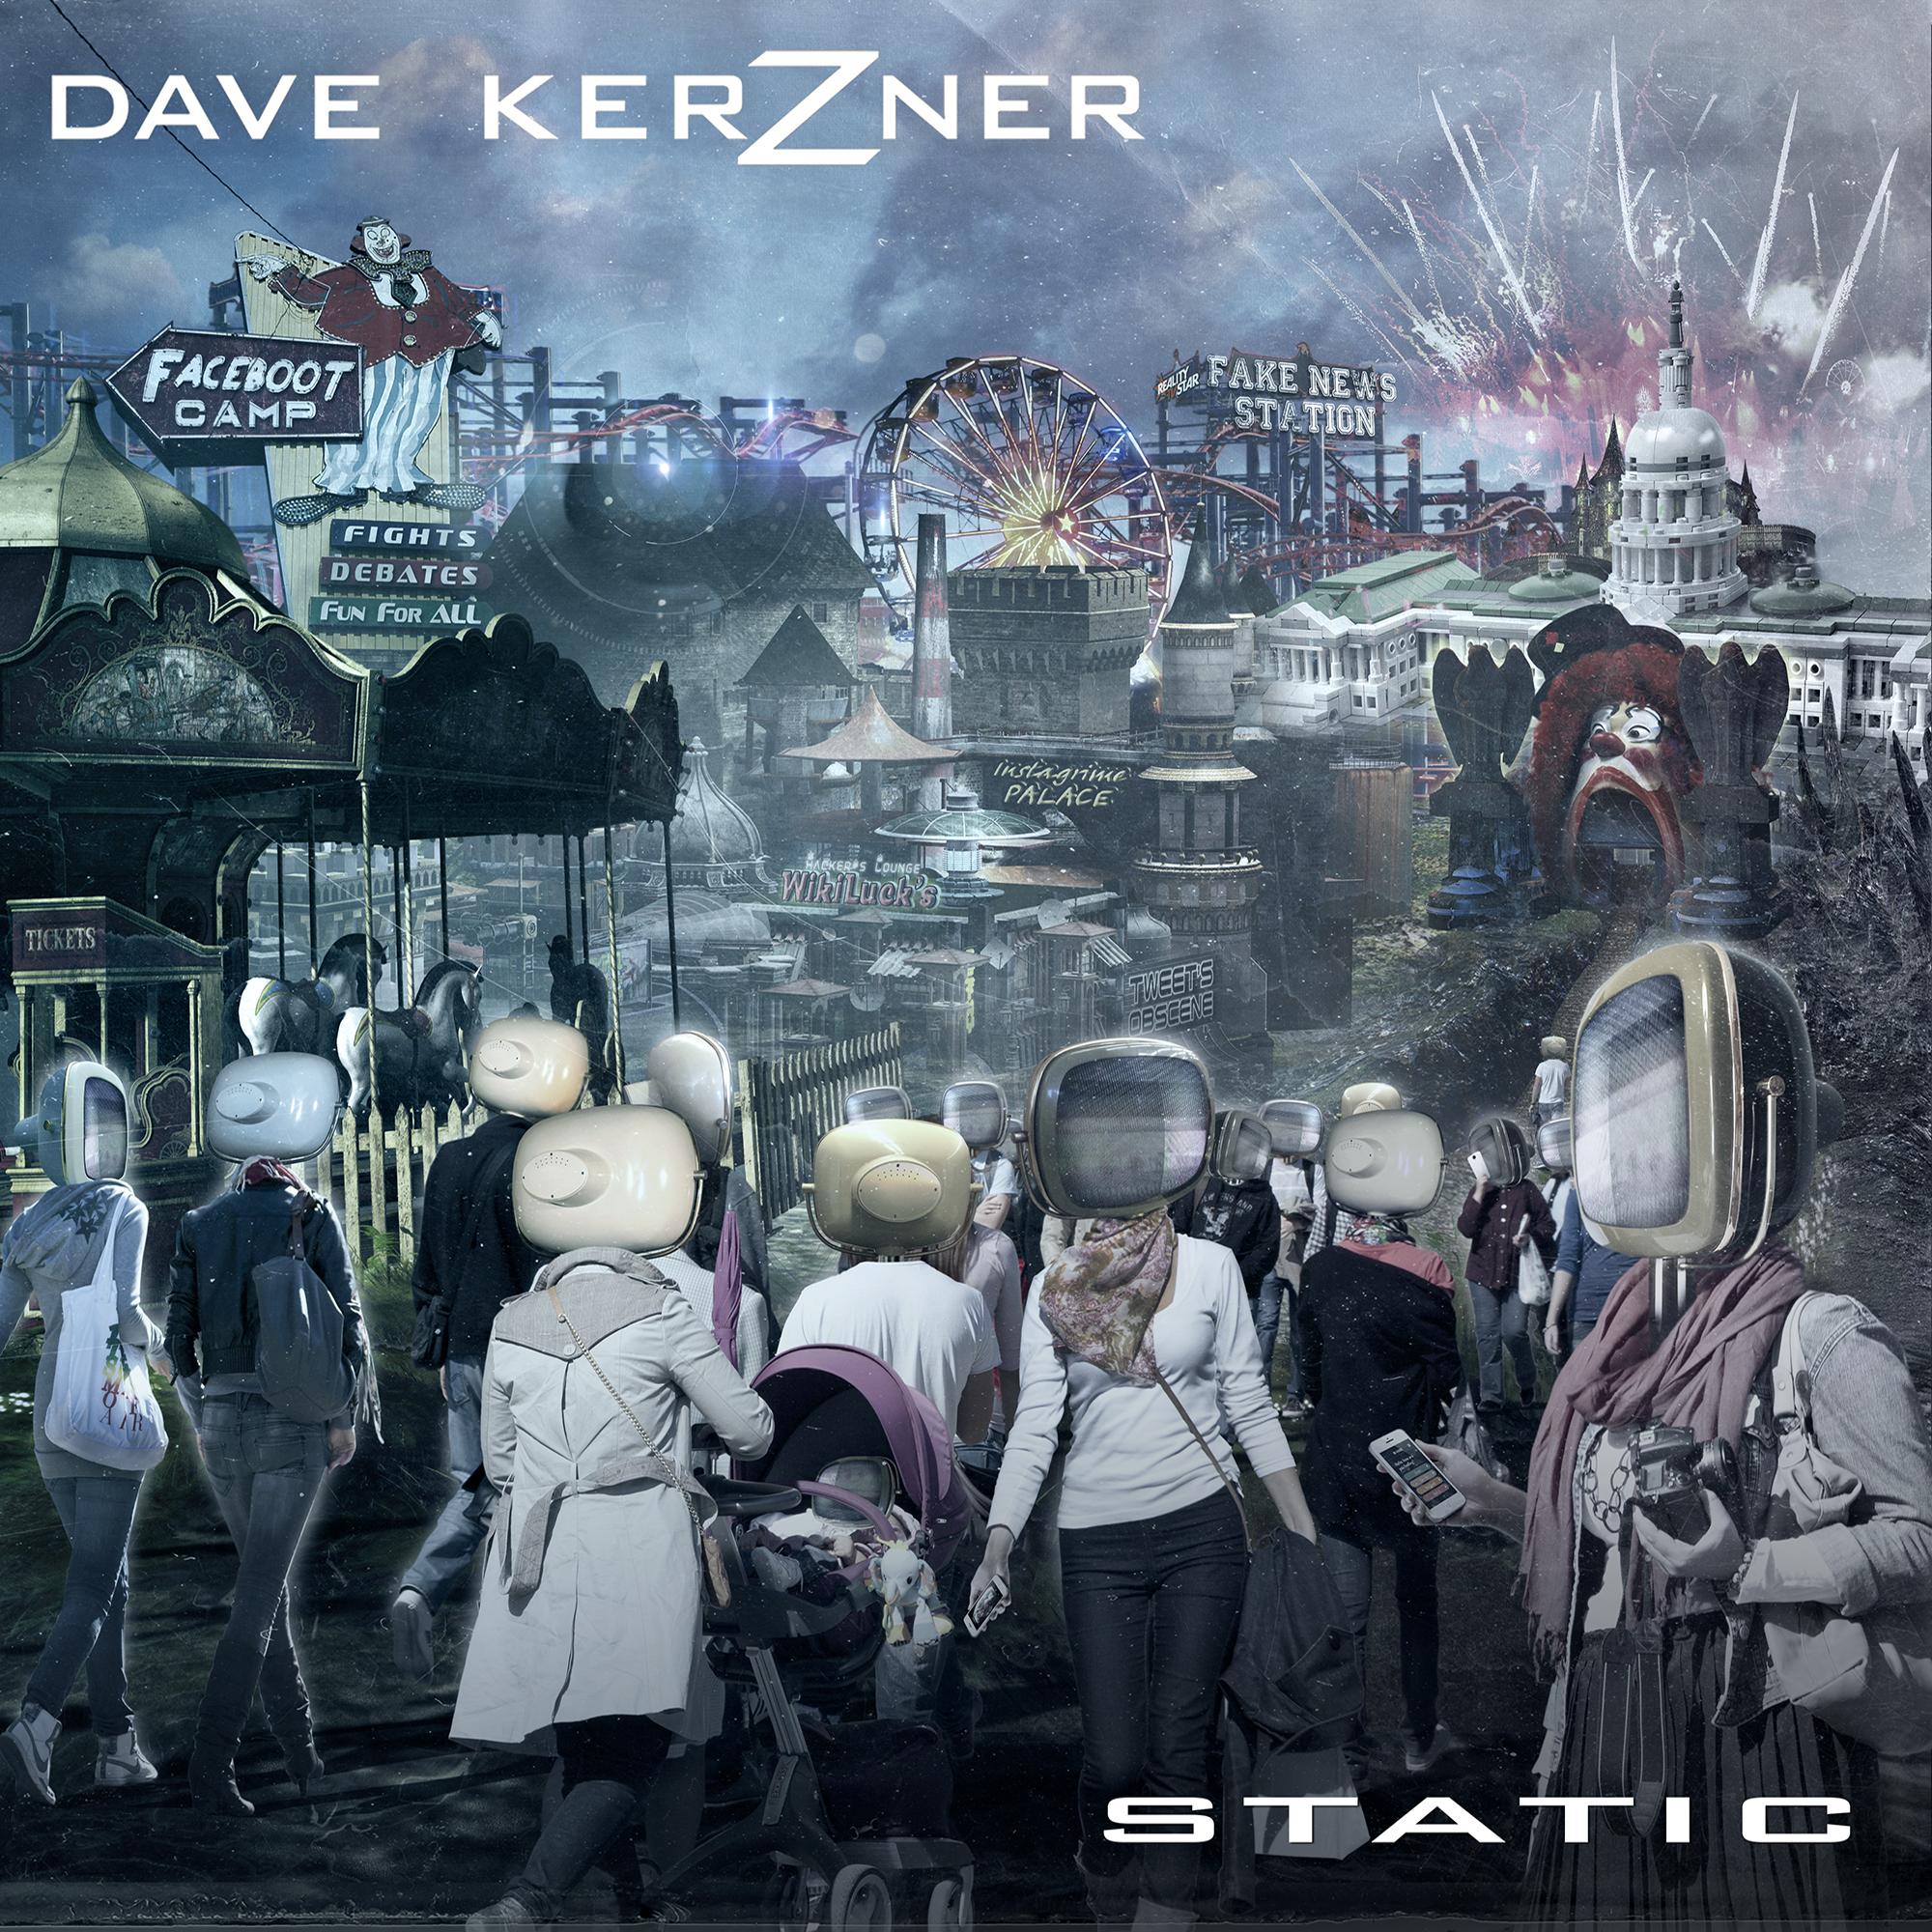 Dave Kerzner – Static (Album Review)